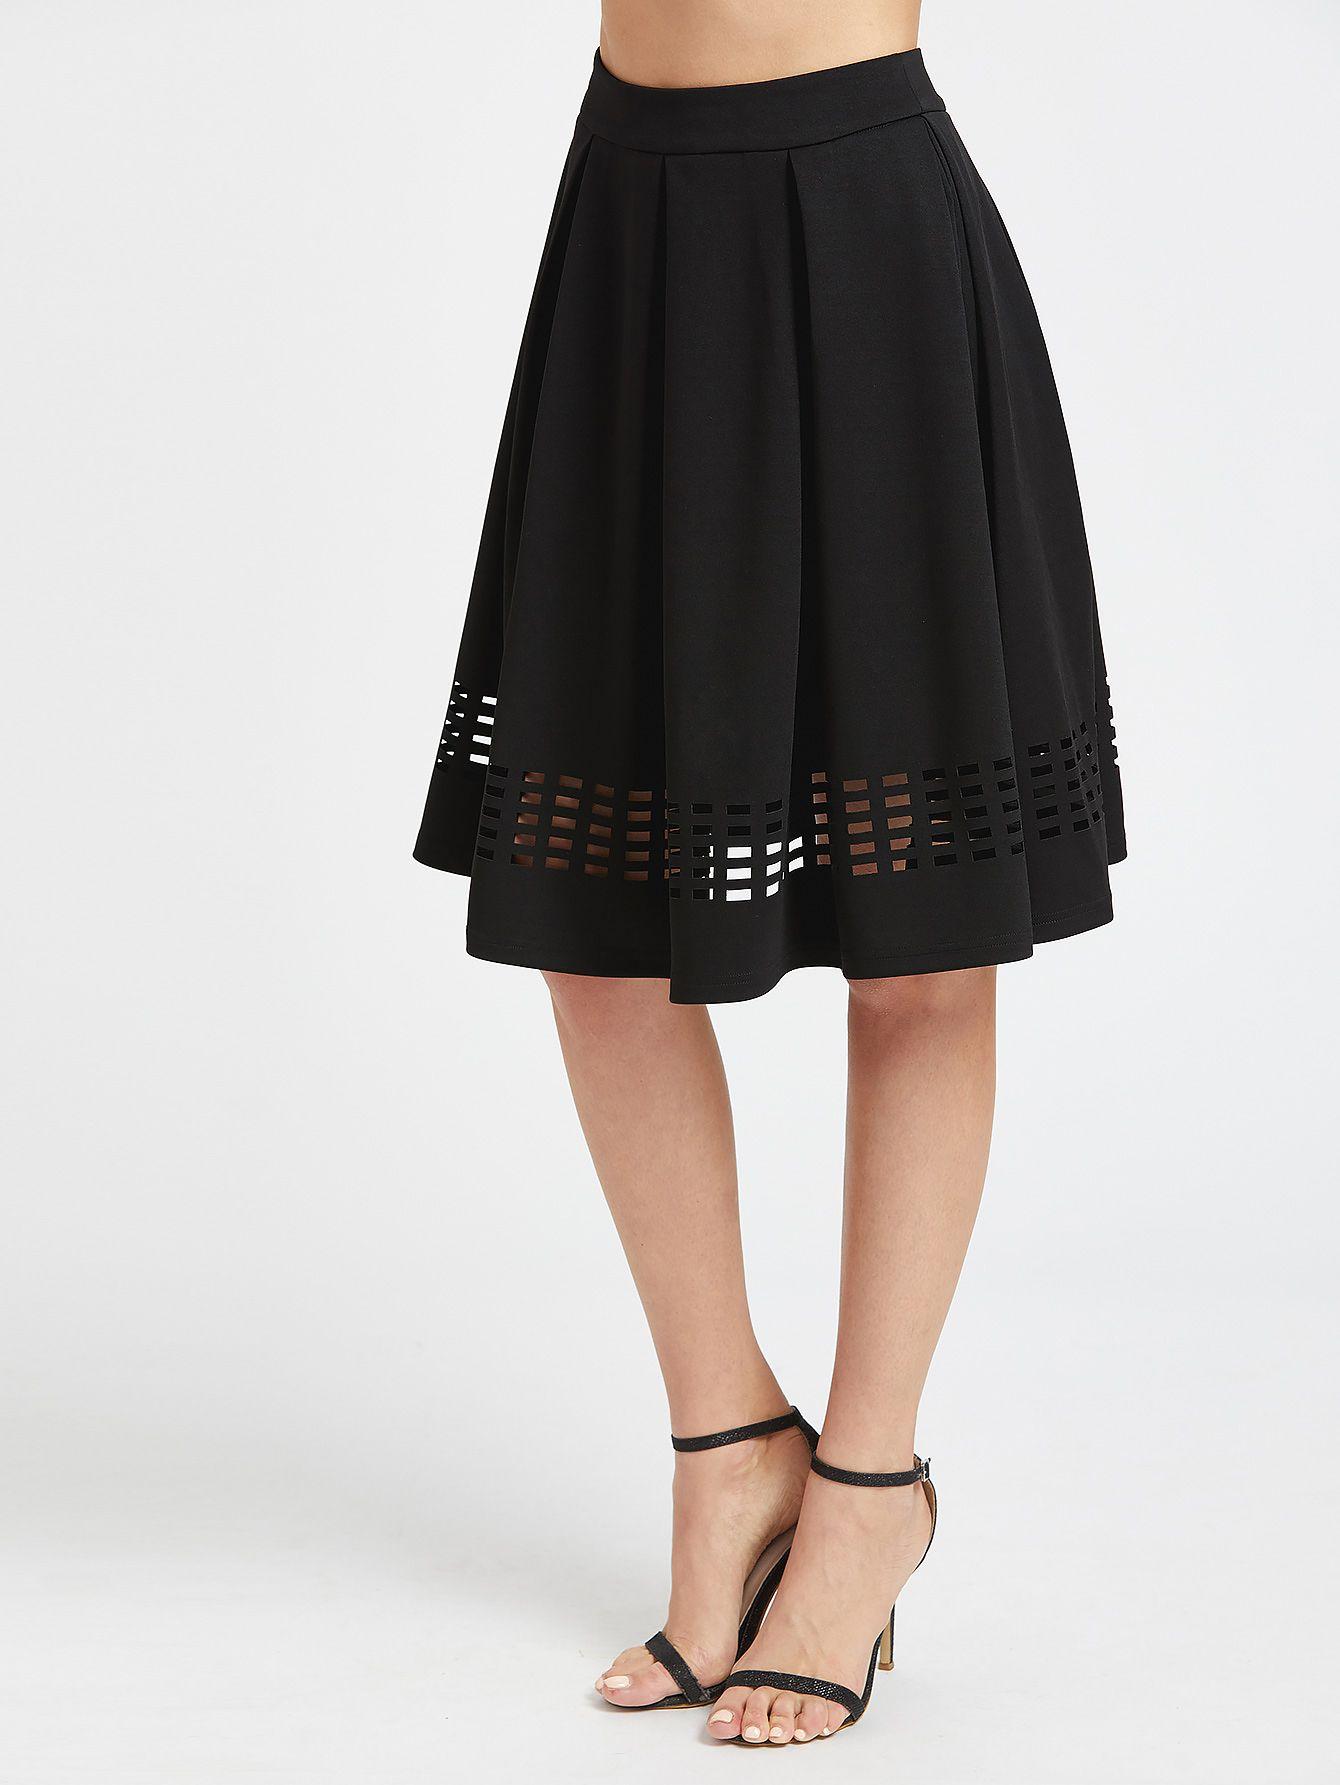 ab9e0a82c1 Shop Laser Cutout Hem Box Pleated Skirt online. SheIn offers Laser Cutout  Hem Box Pleated